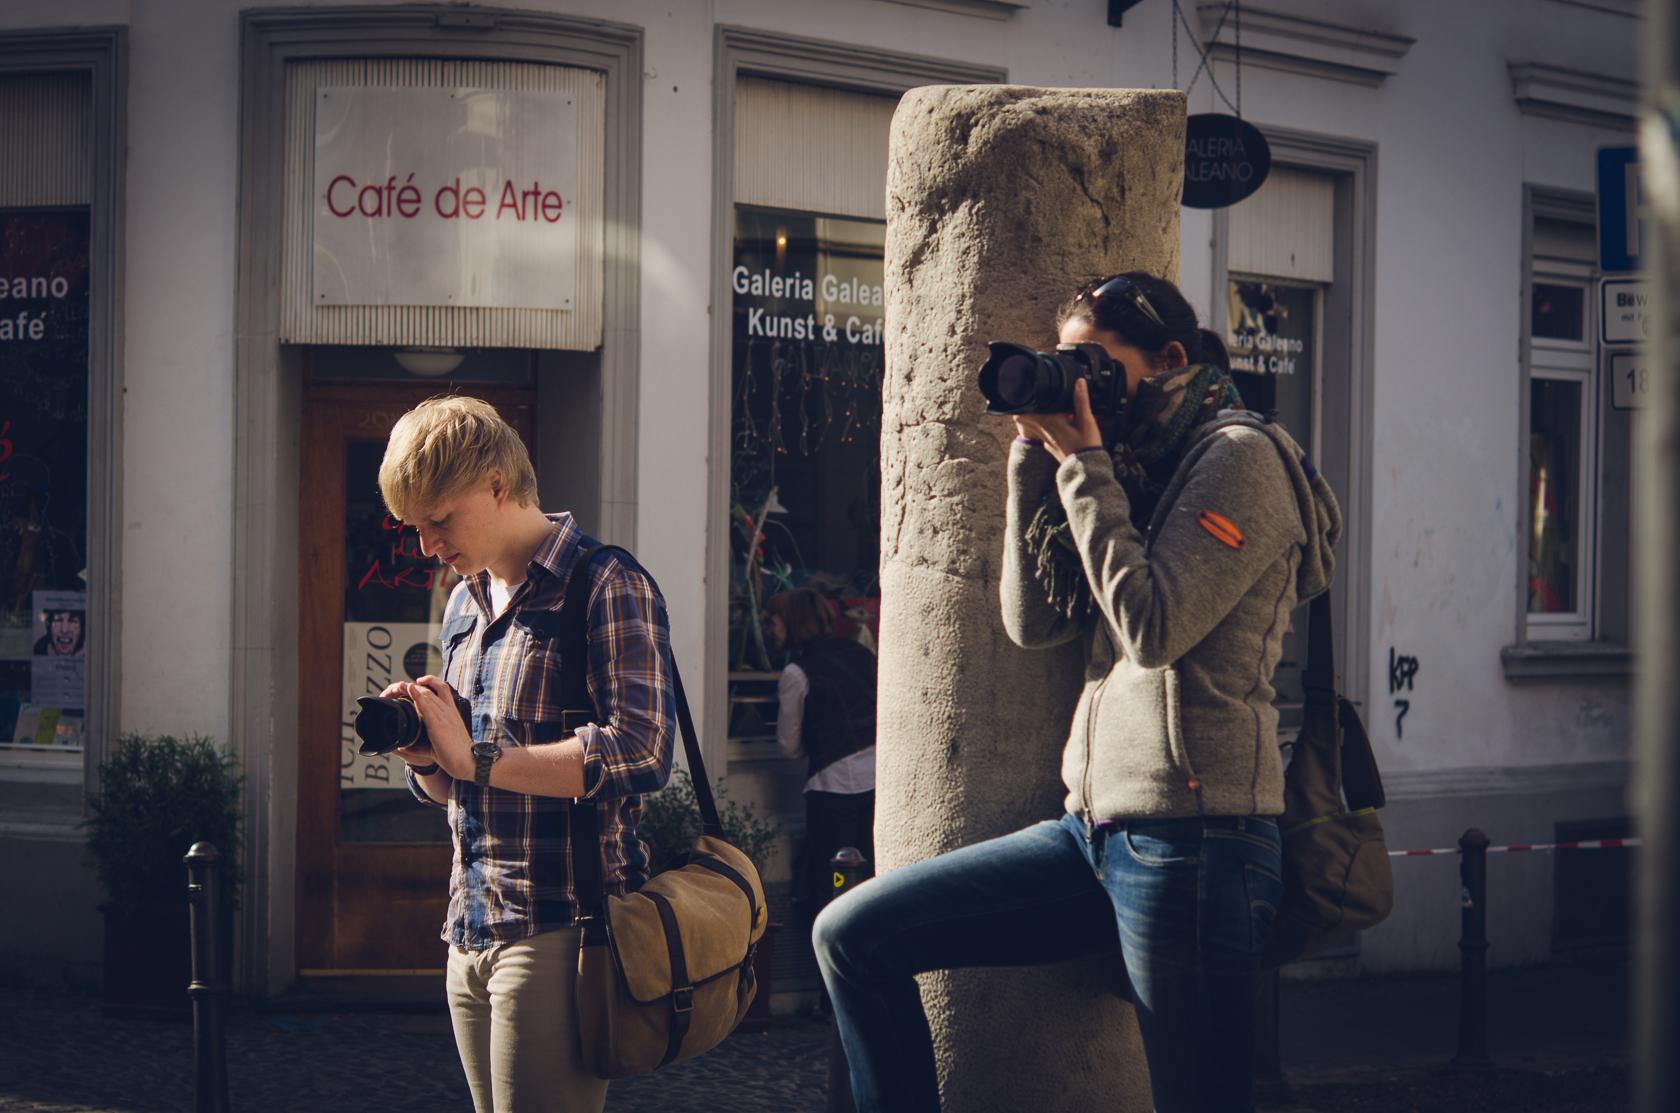 Fotograf_innen